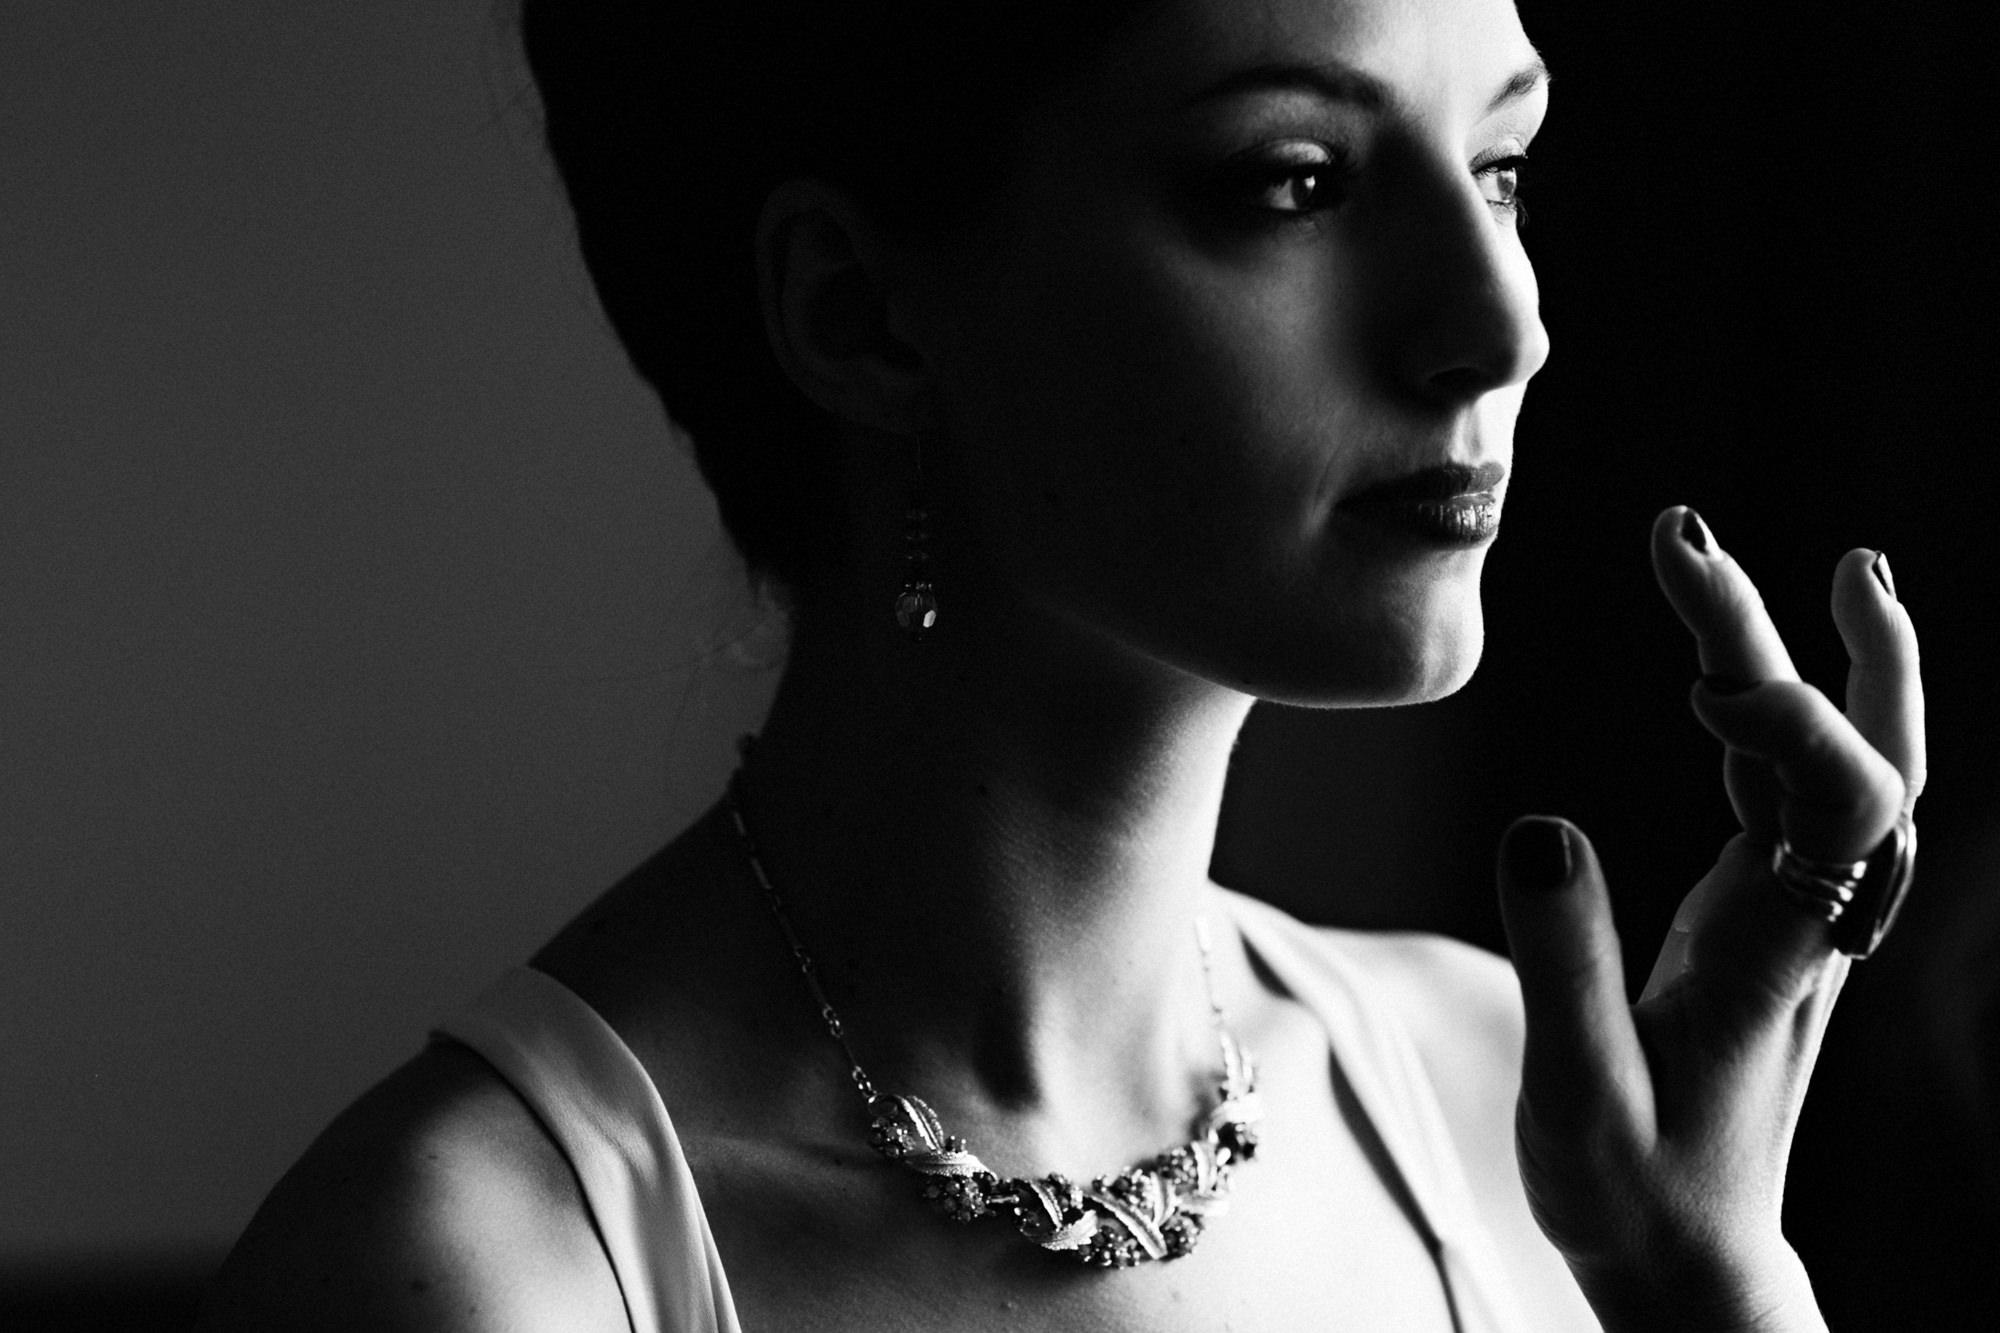 Bride smooths lipsick - PhotoJJ